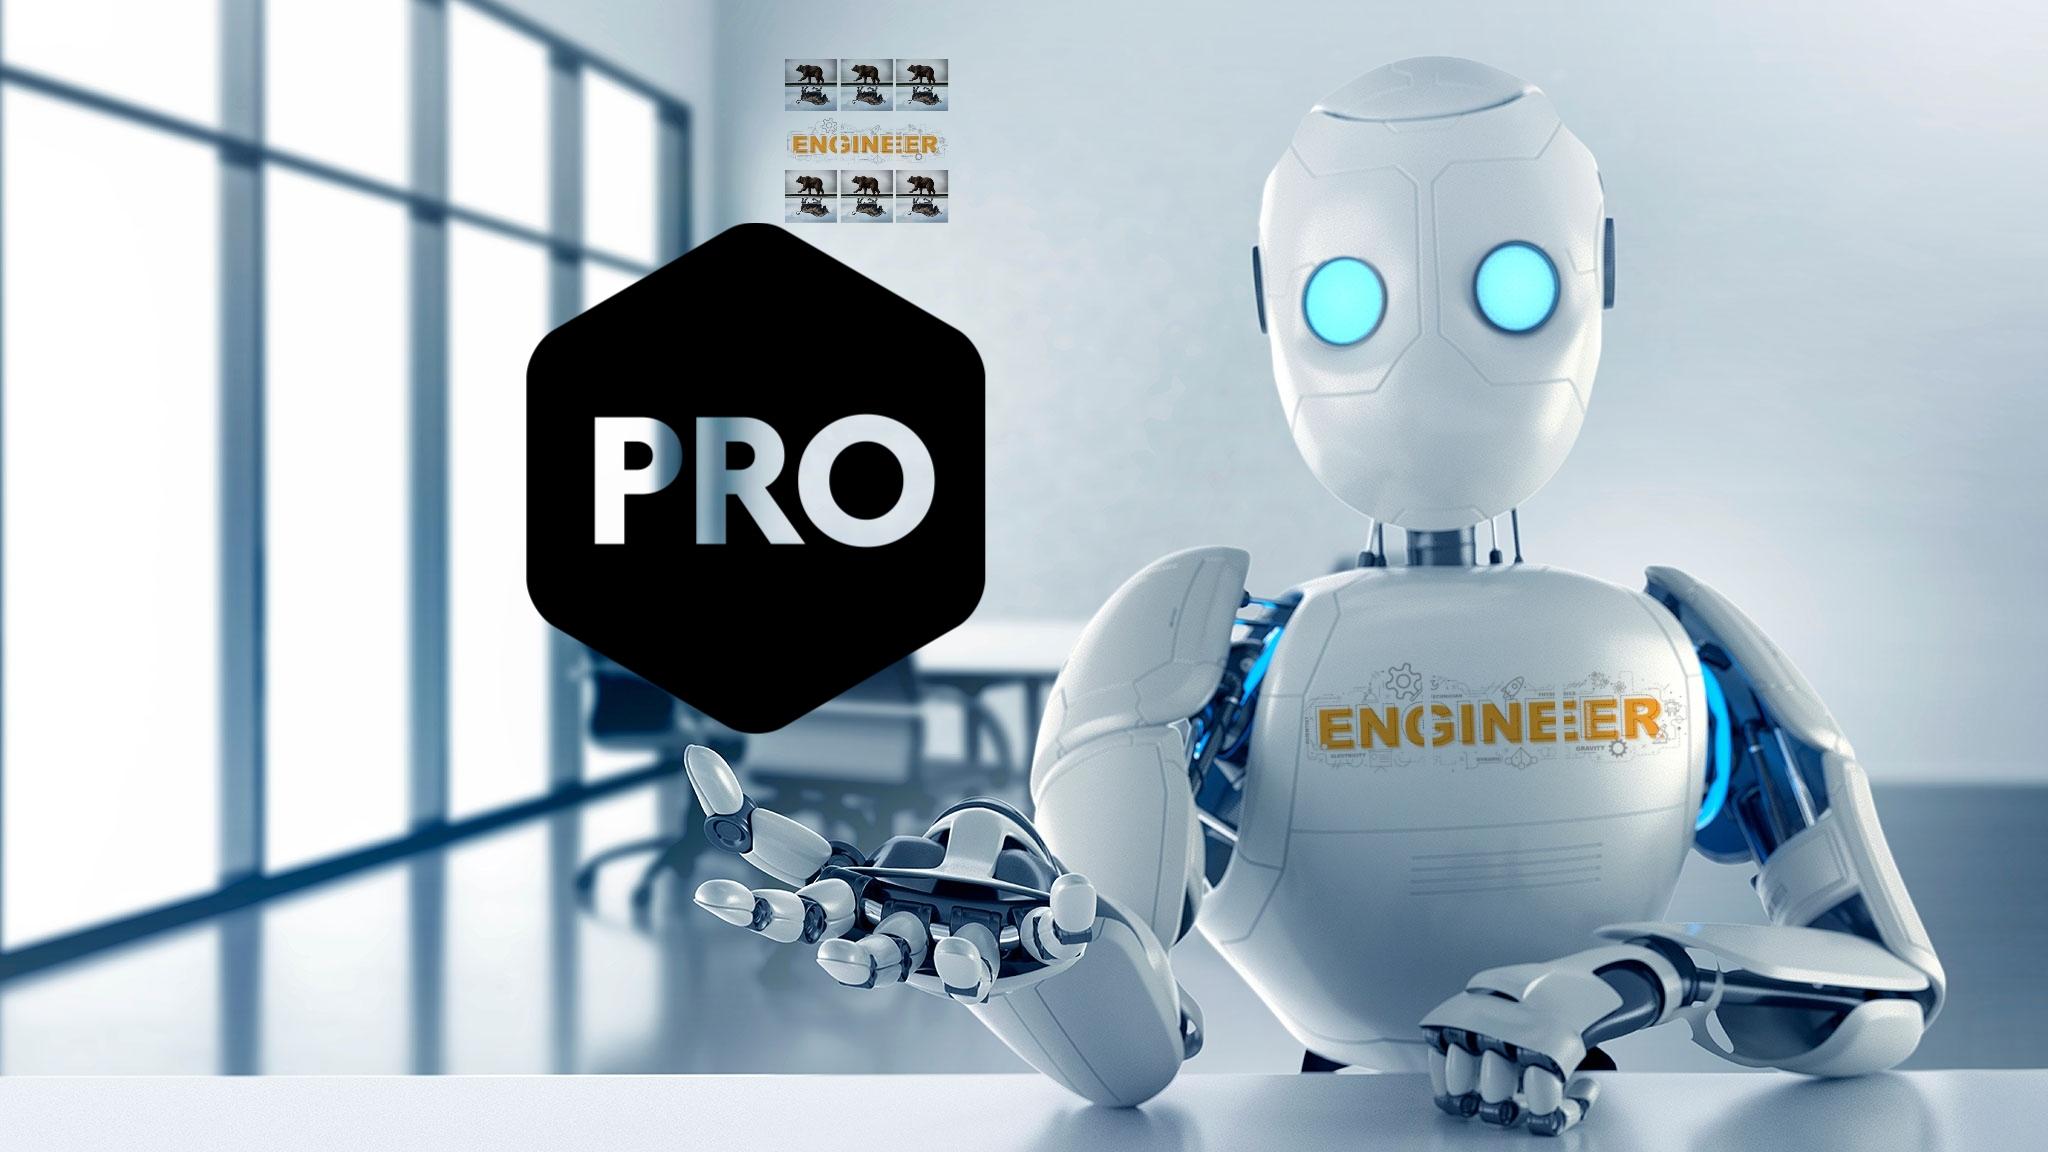 engineering robo pro